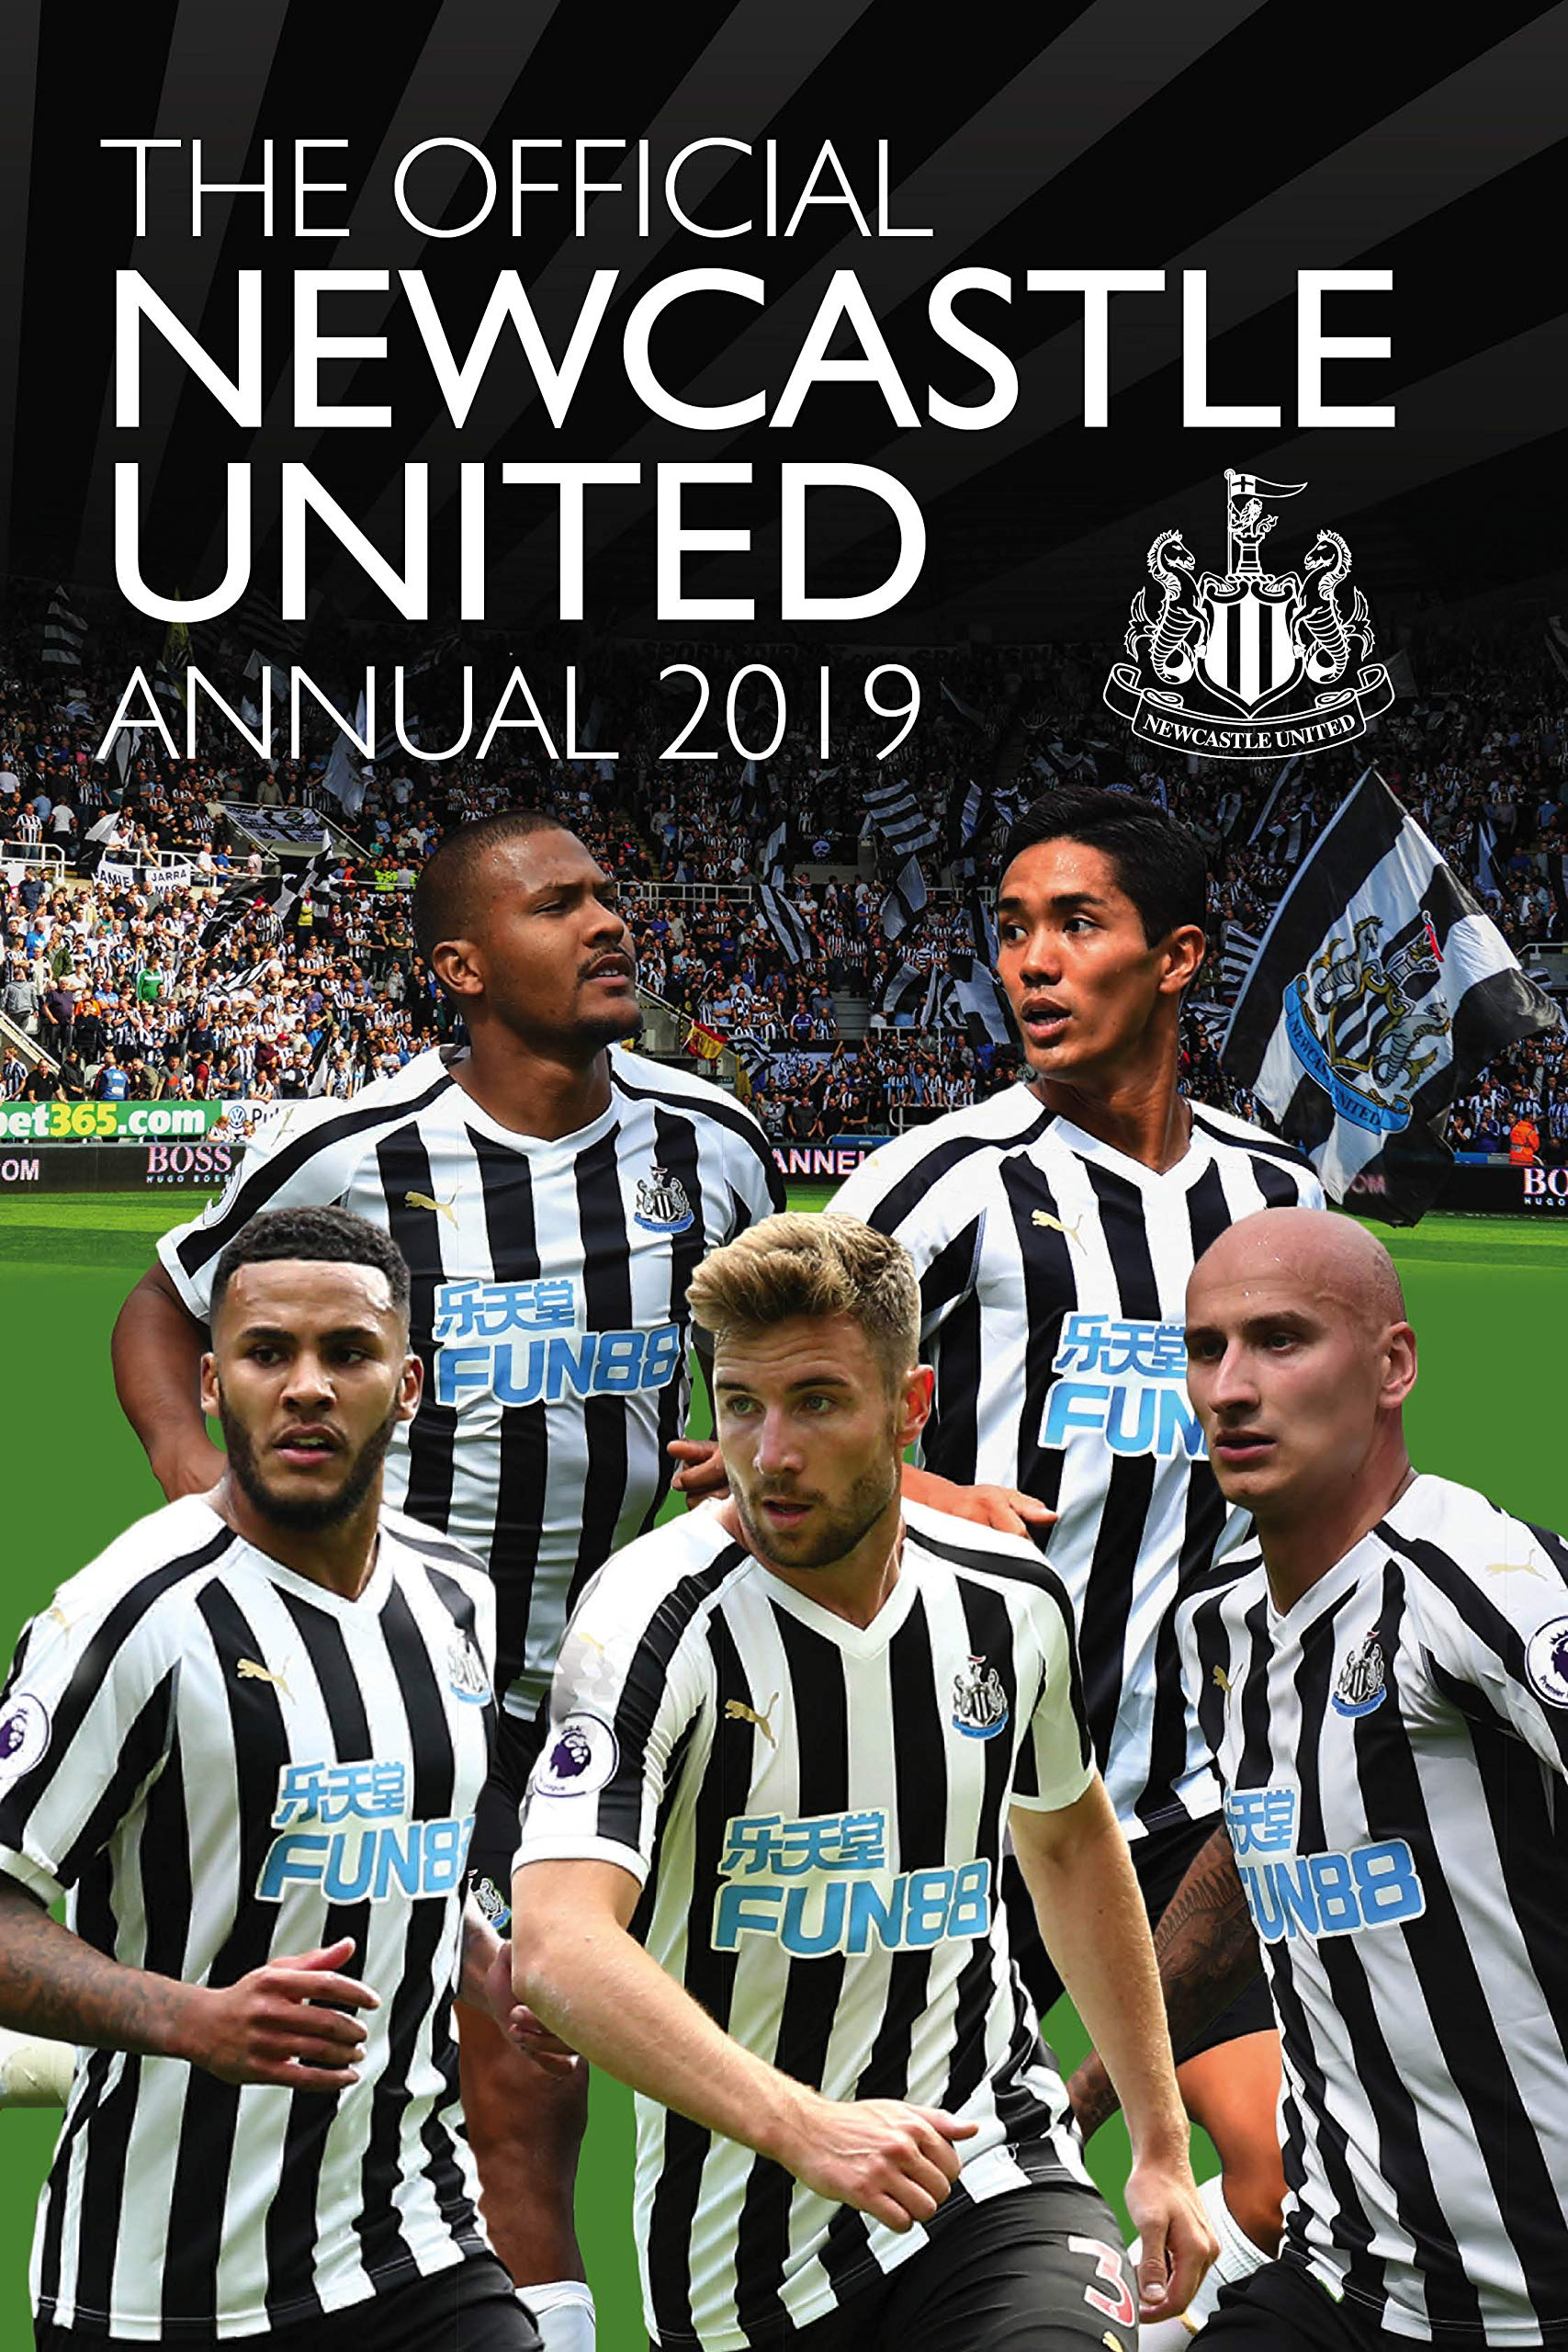 The Official Newcastle United Fc Annual 2019 Amazon Co Uk Mark Hannen 9781912595150 Books